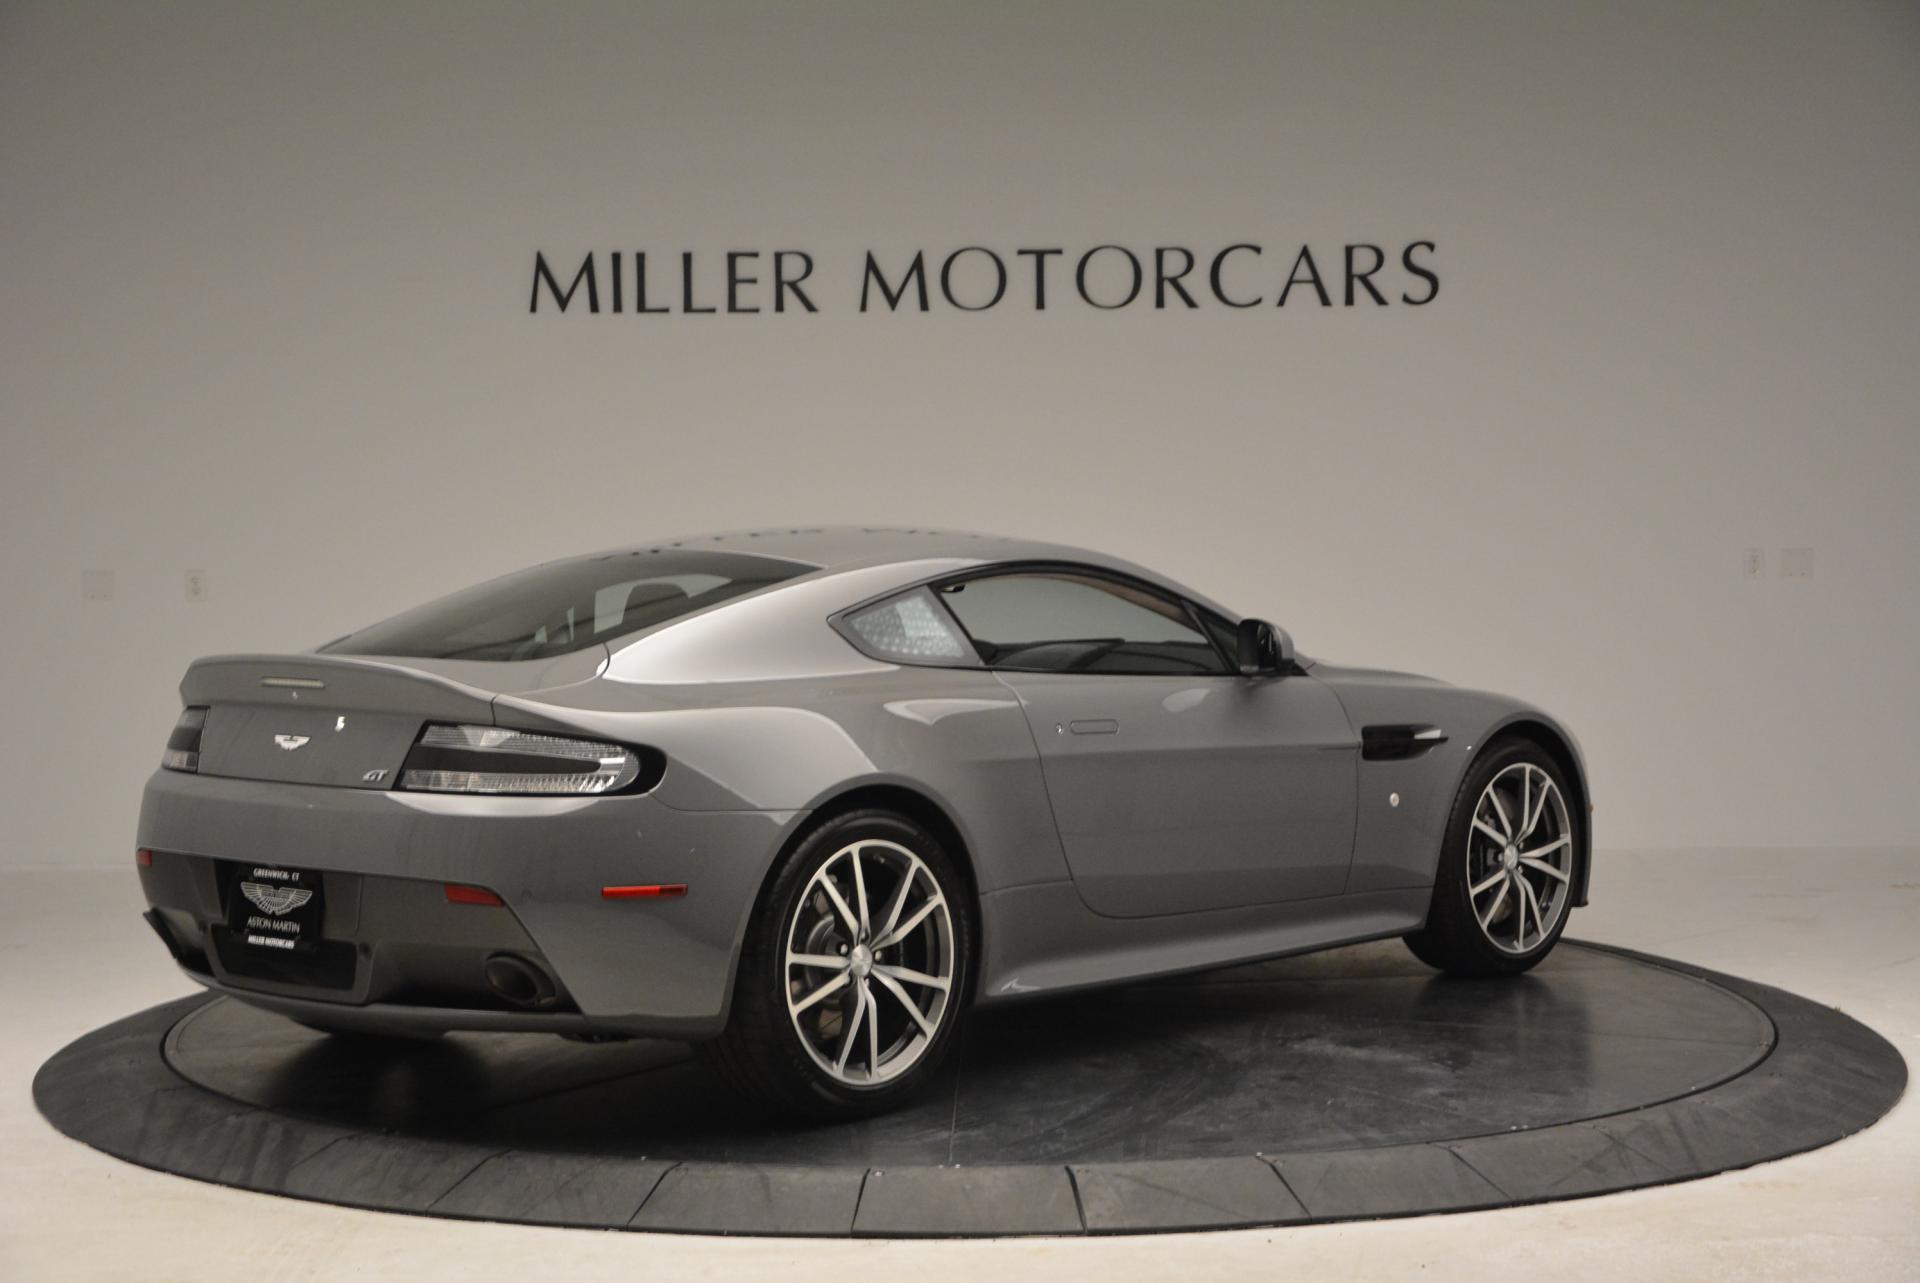 New 2016 Aston Martin Vantage GT  For Sale In Westport, CT 100_p8